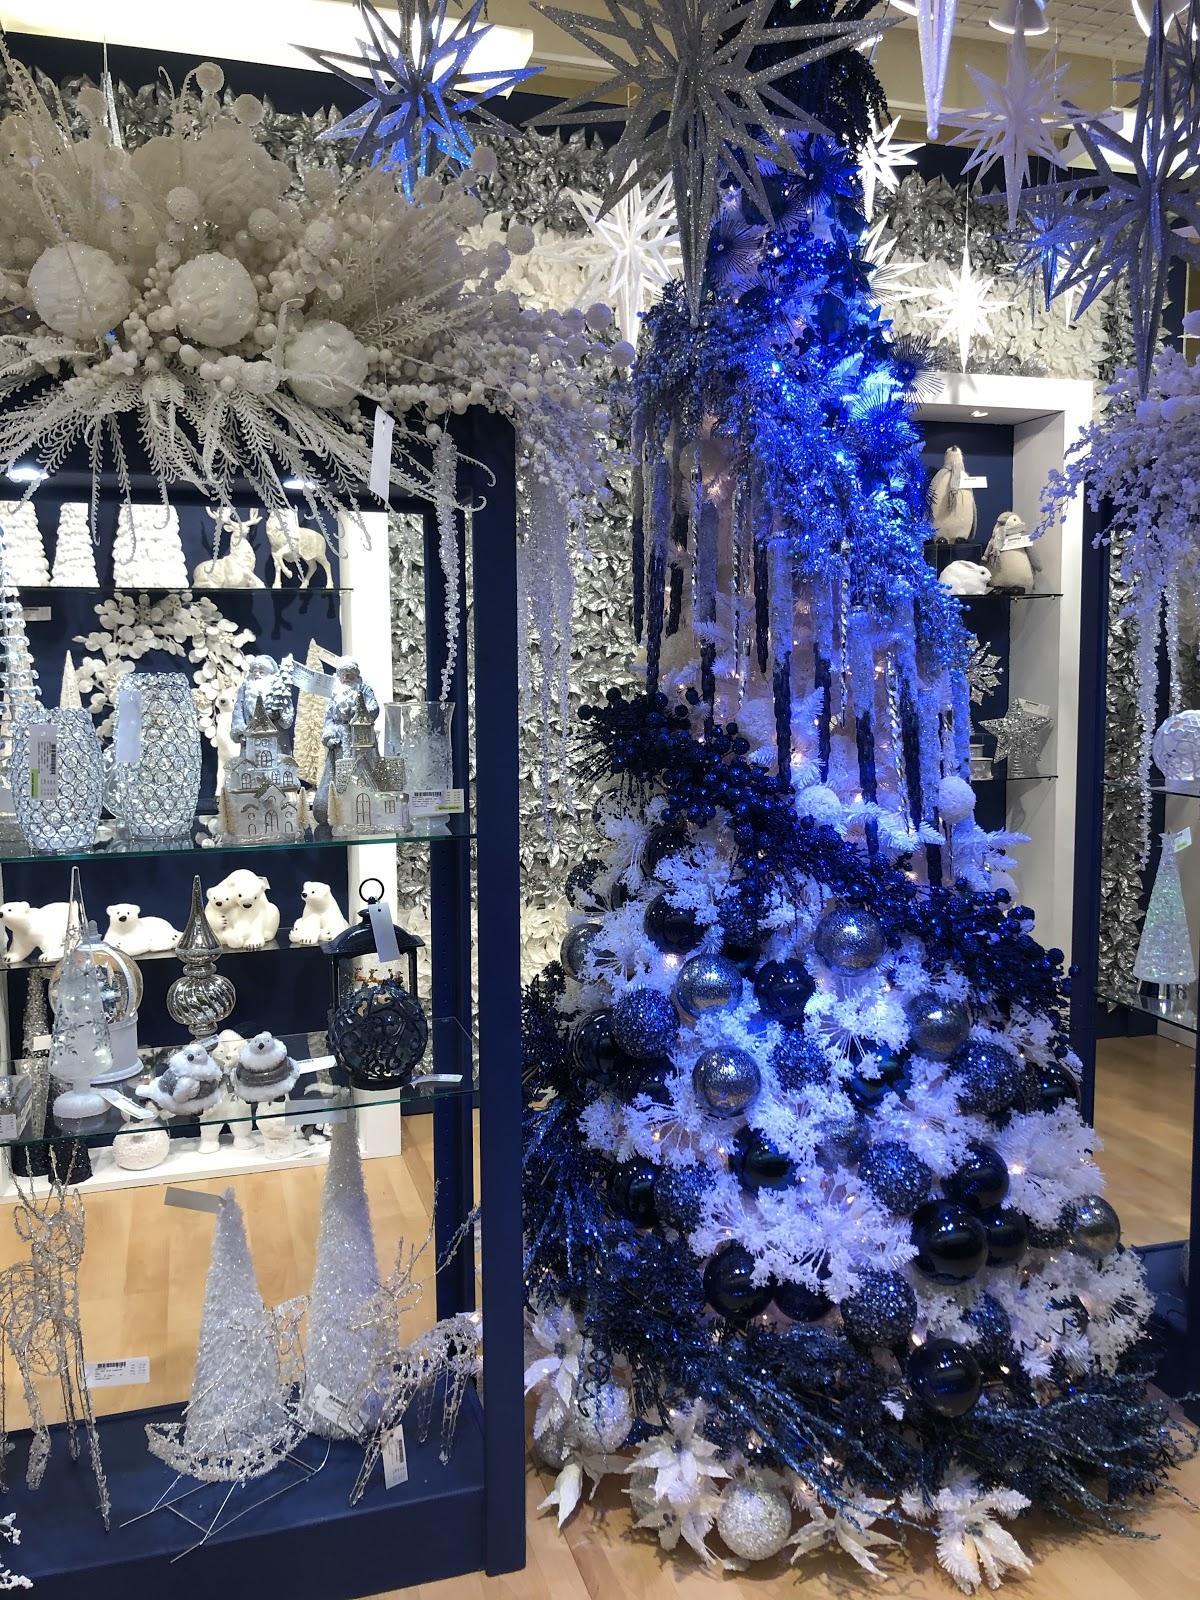 Christmas Decorating Trends 2020: μπλε φώτα στο χριστουγεννιάτικο δέντρο